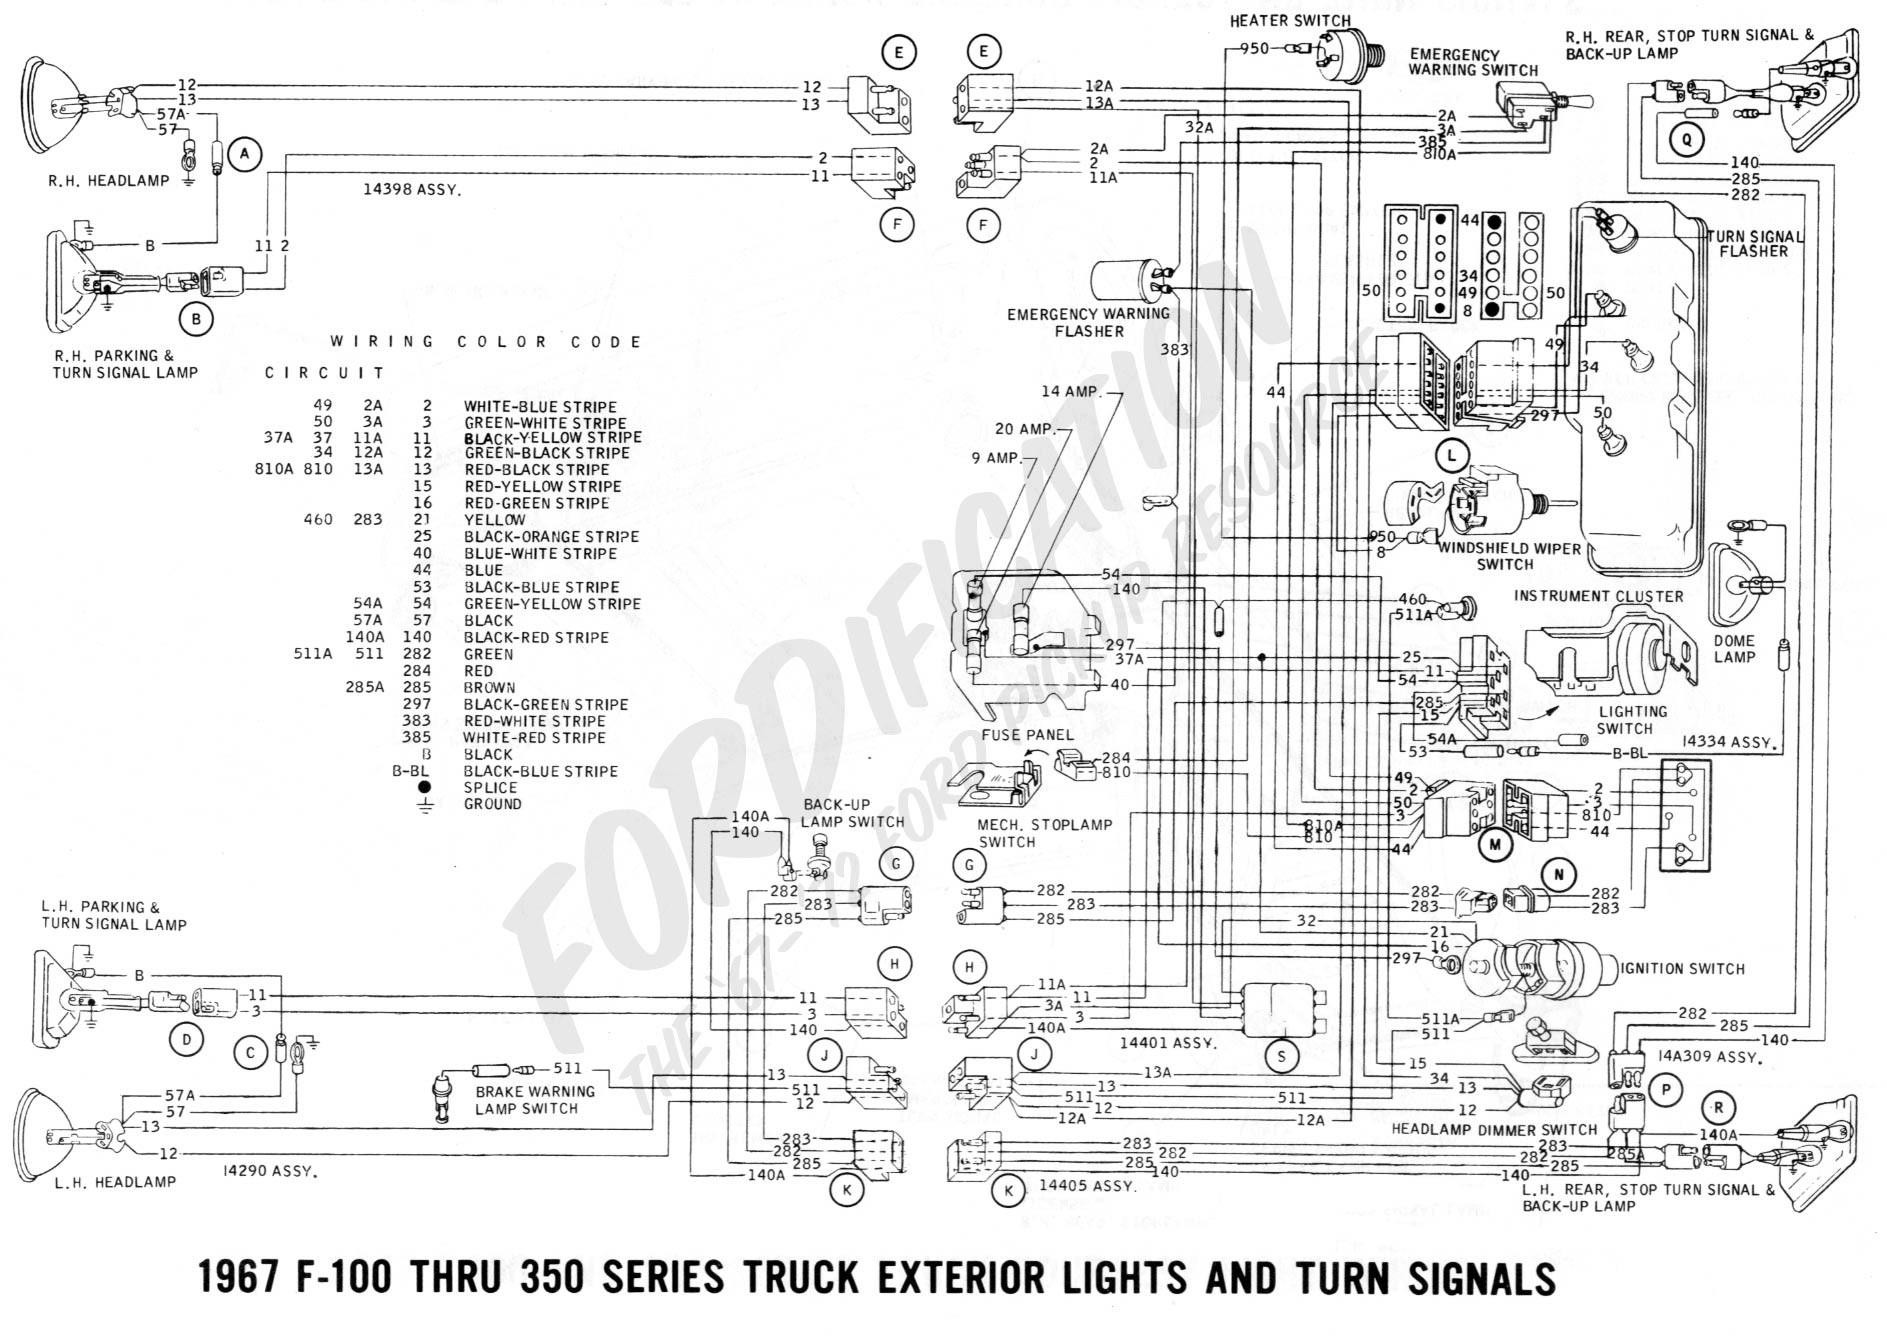 Turn Signal Switch Diagram